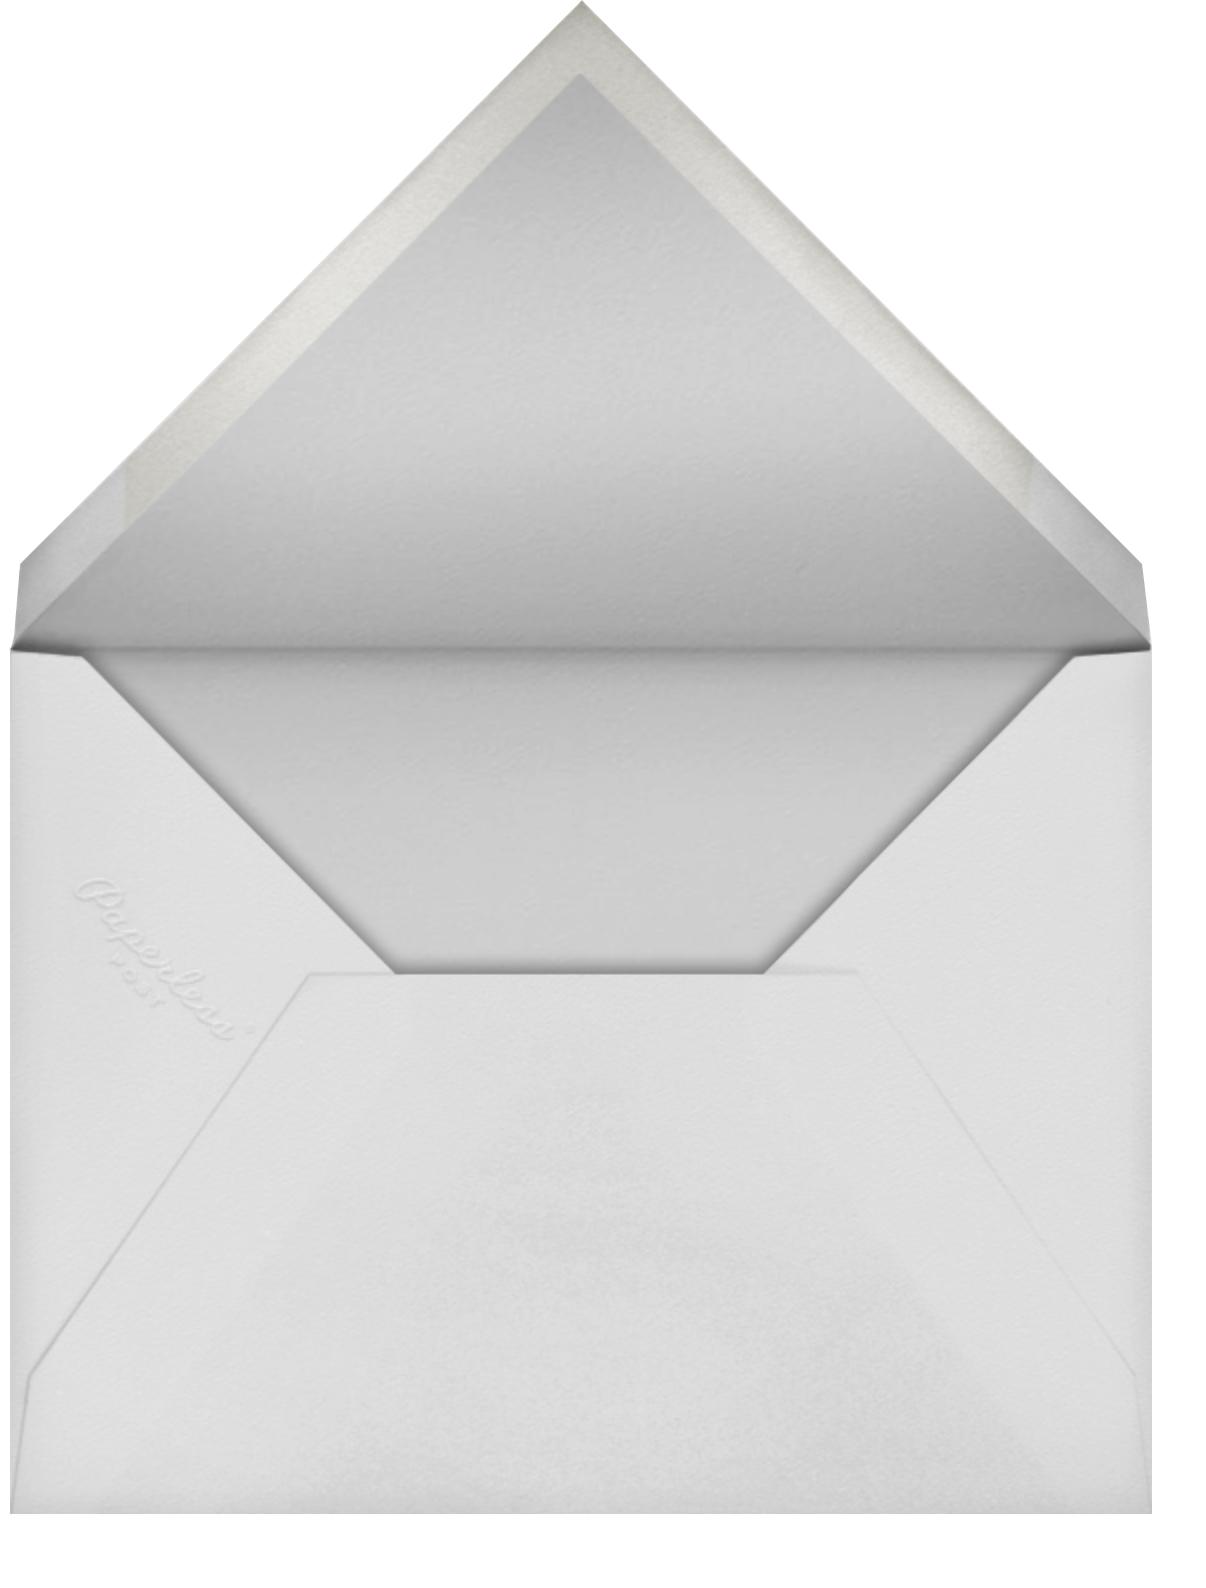 Fleurs d'Alençon - White - Oscar de la Renta - Bridal shower - envelope back